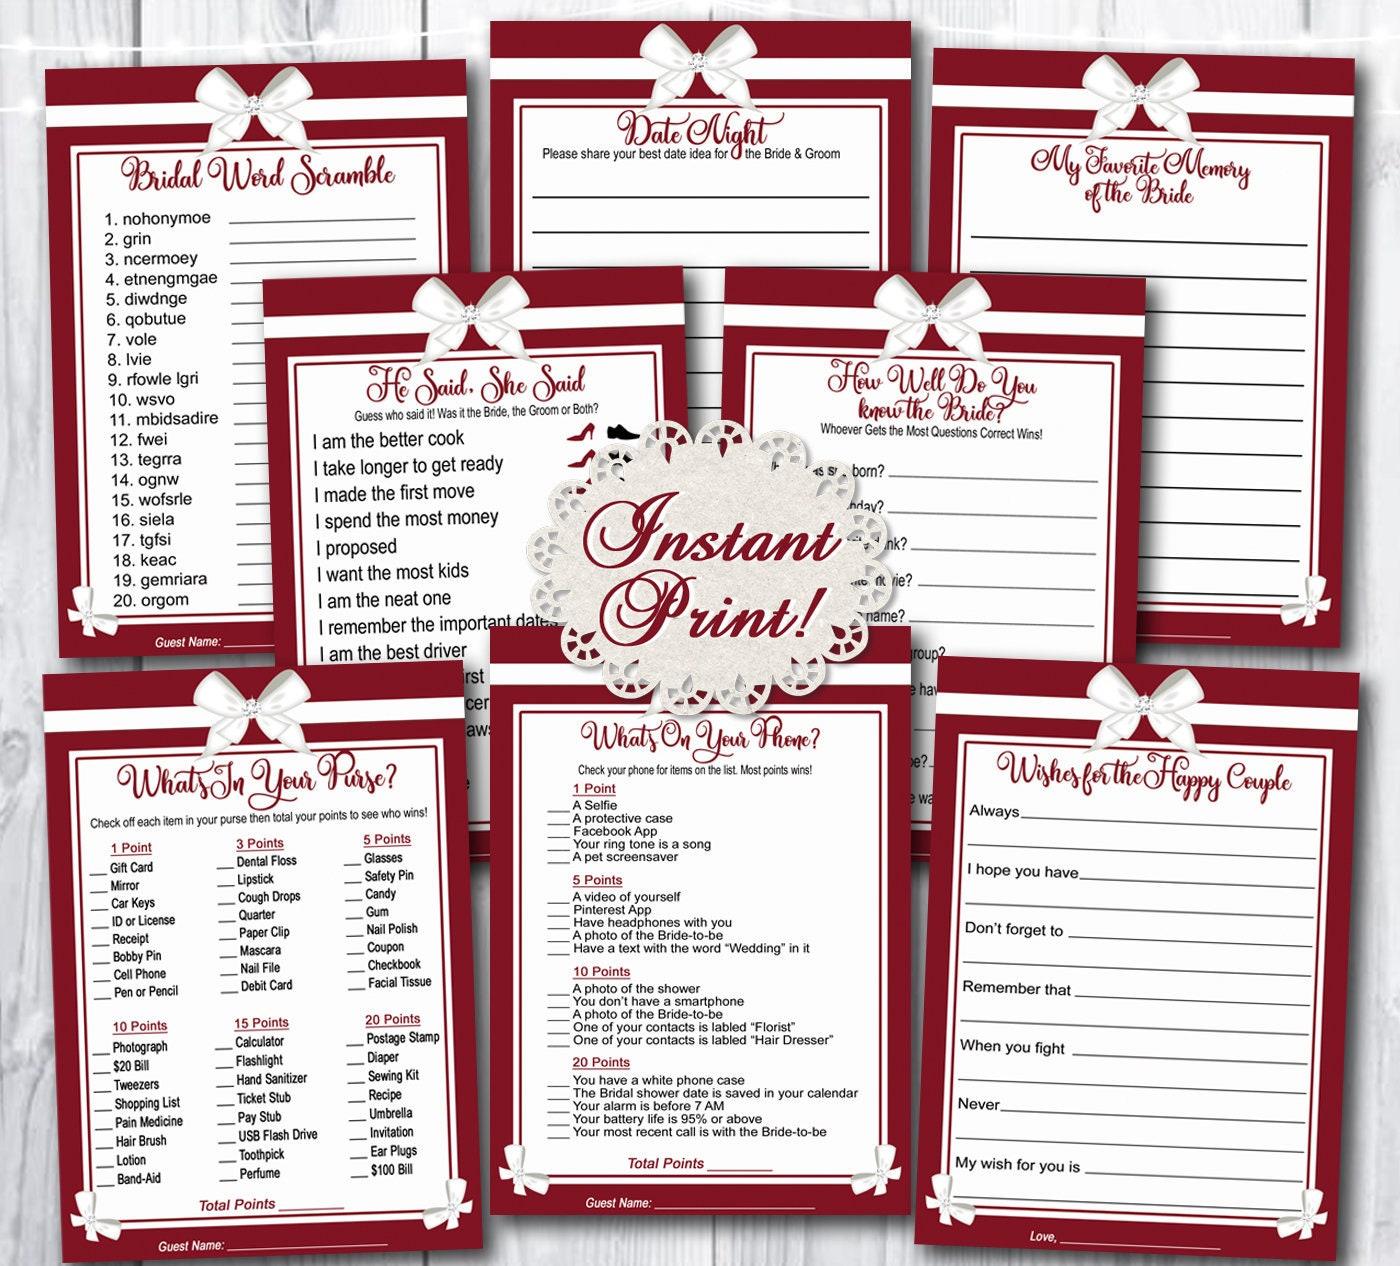 Burgundy w/White Bows Bridal Shower Games Printable / Wedding Shower Party  Games Set of 8 / INSTANT DOWNLOAD / Instant Print Bridal Games